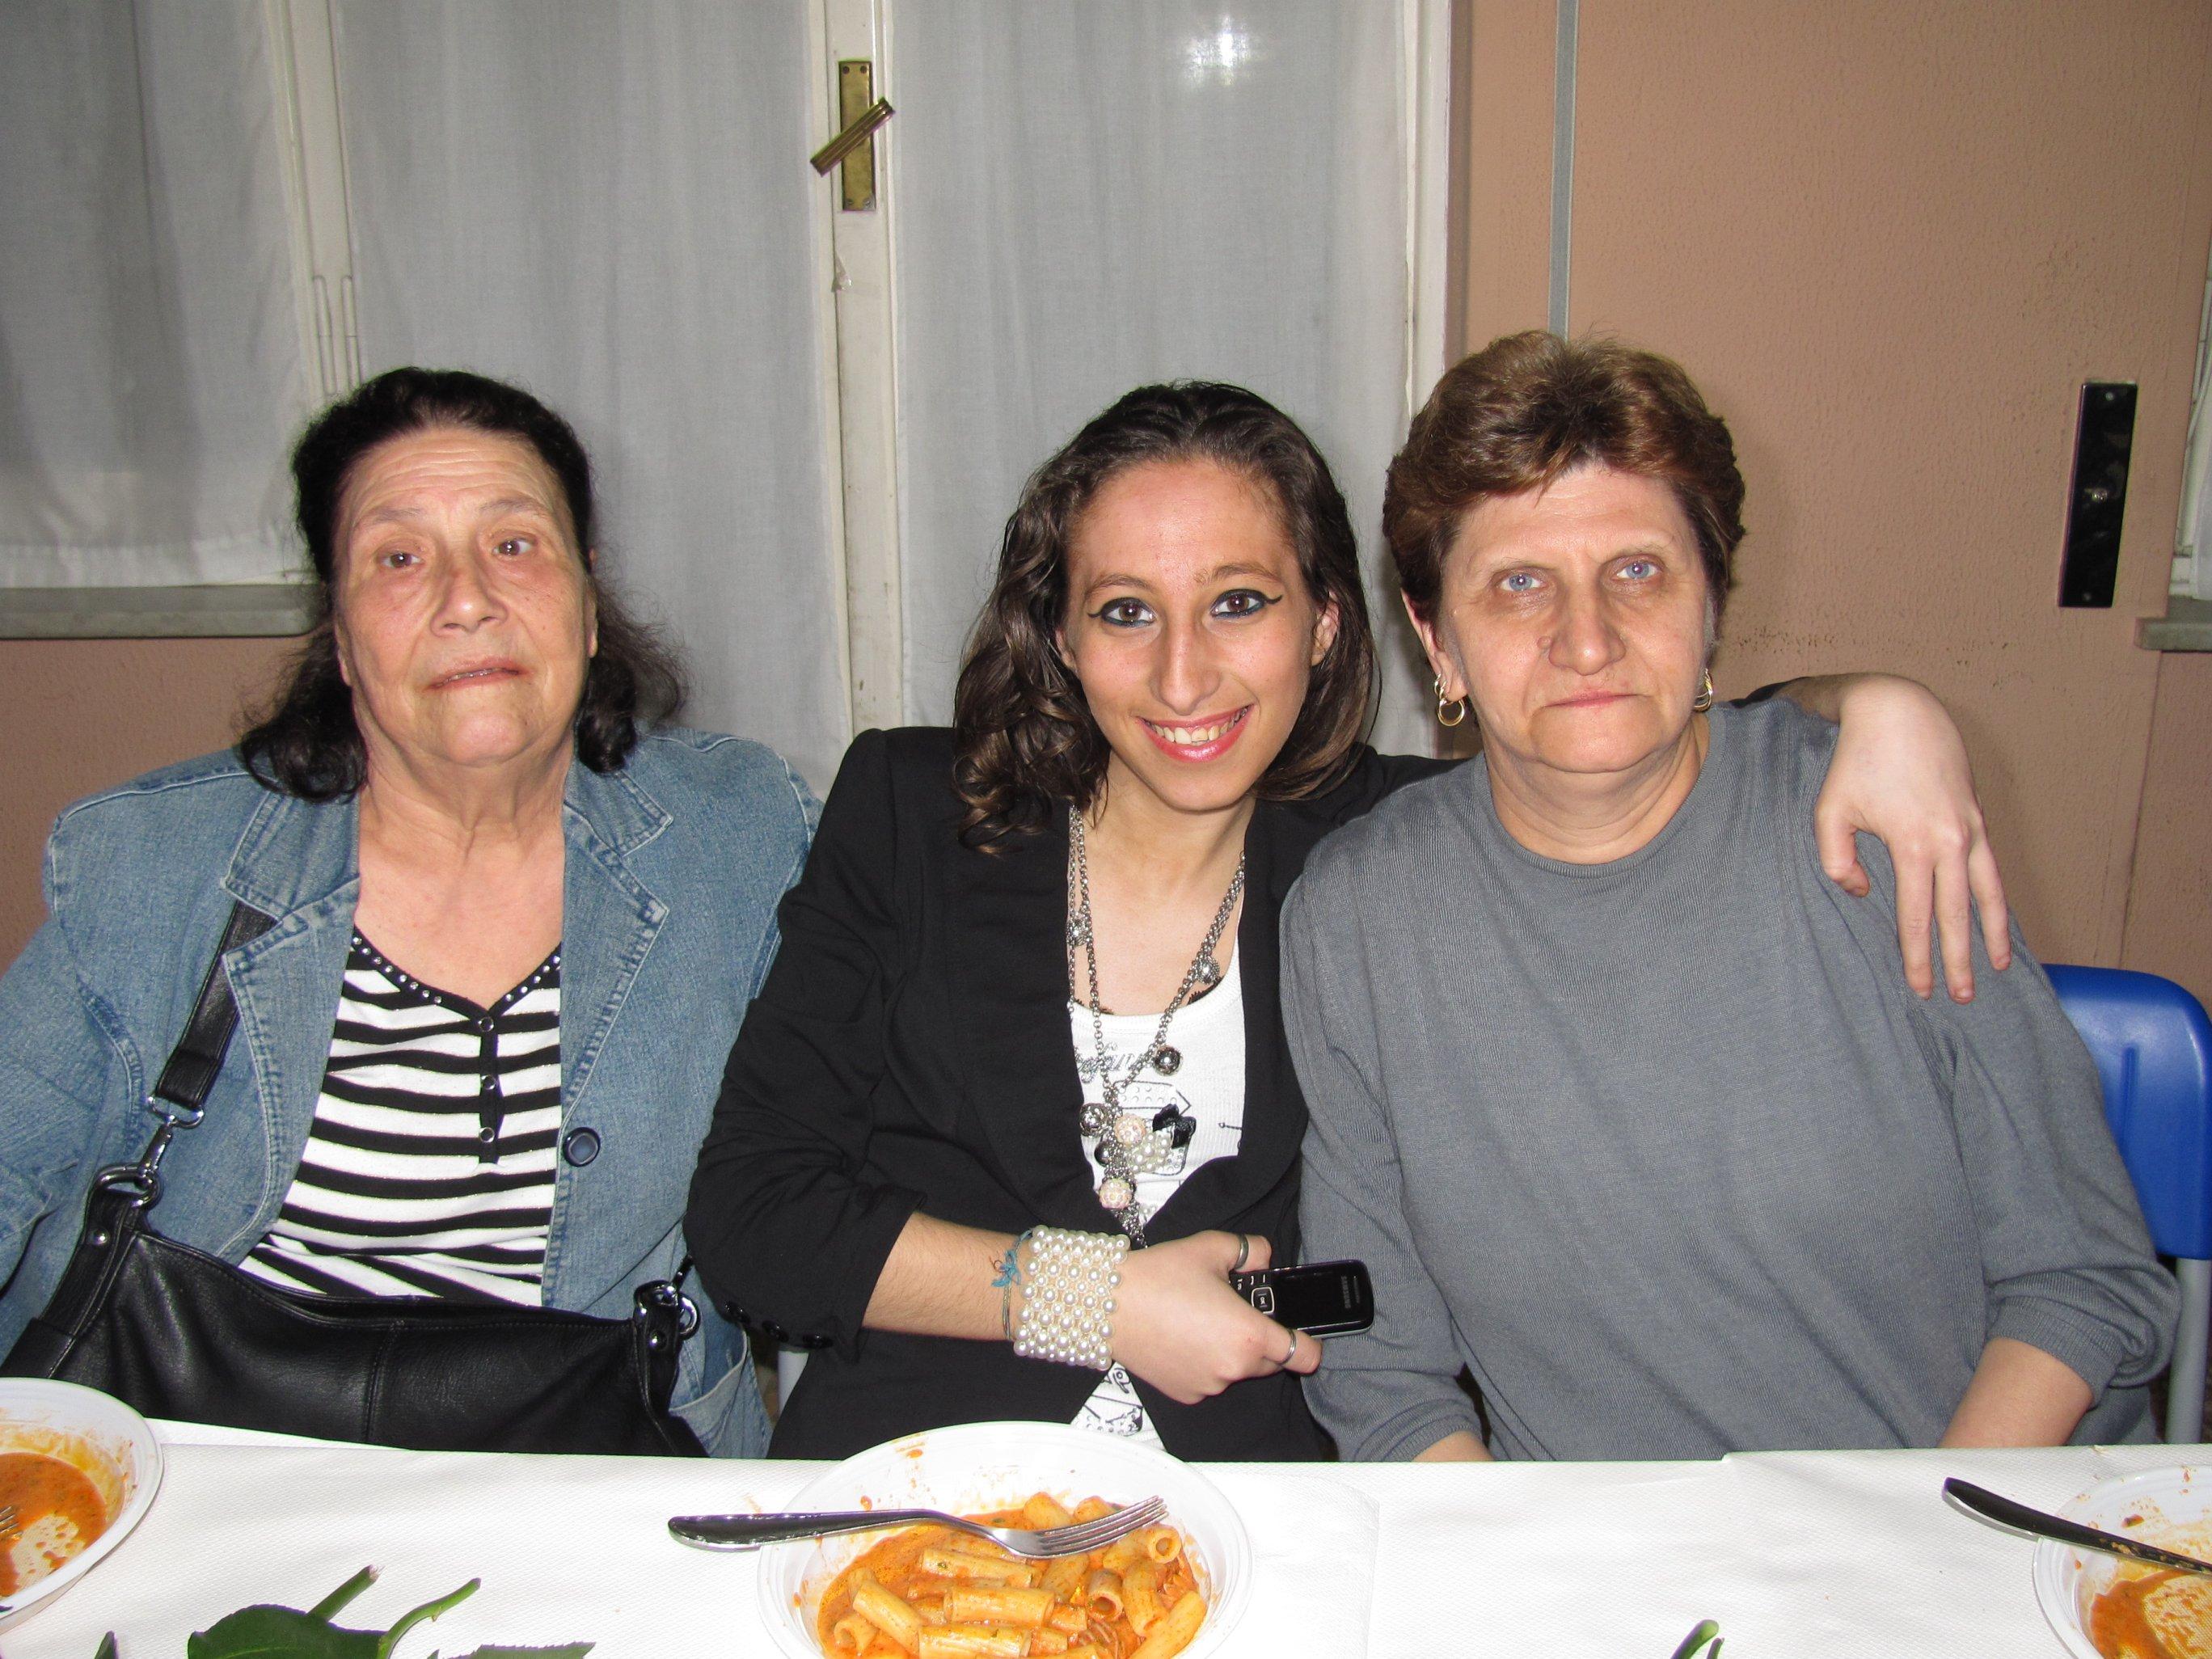 festa_madonna_2012-05-27-21-59-50